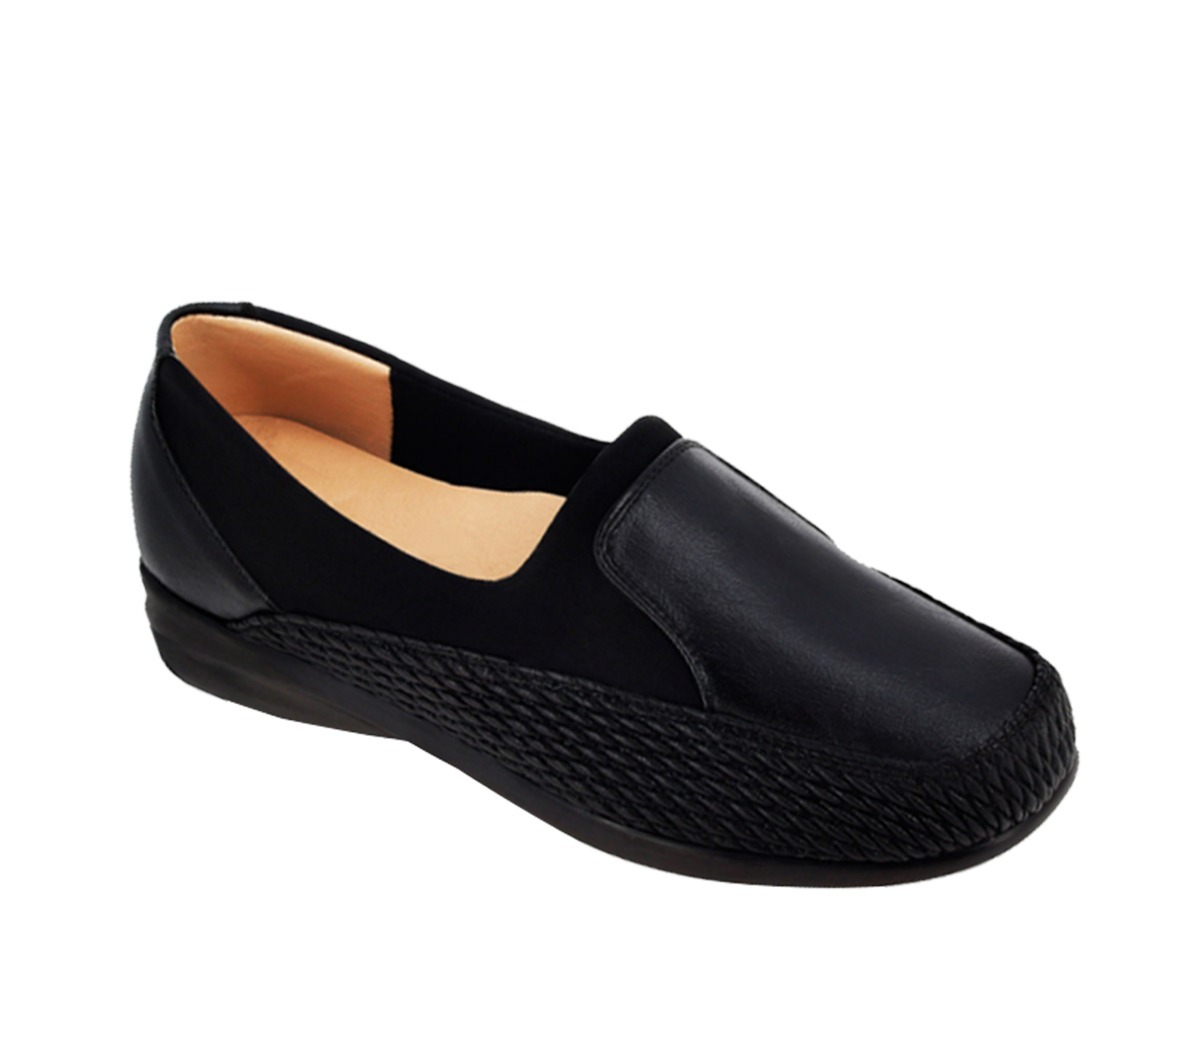 8821455b37a zapato piel addiction negro mujer 640 diabetico ortopedico. Cargando zoom.